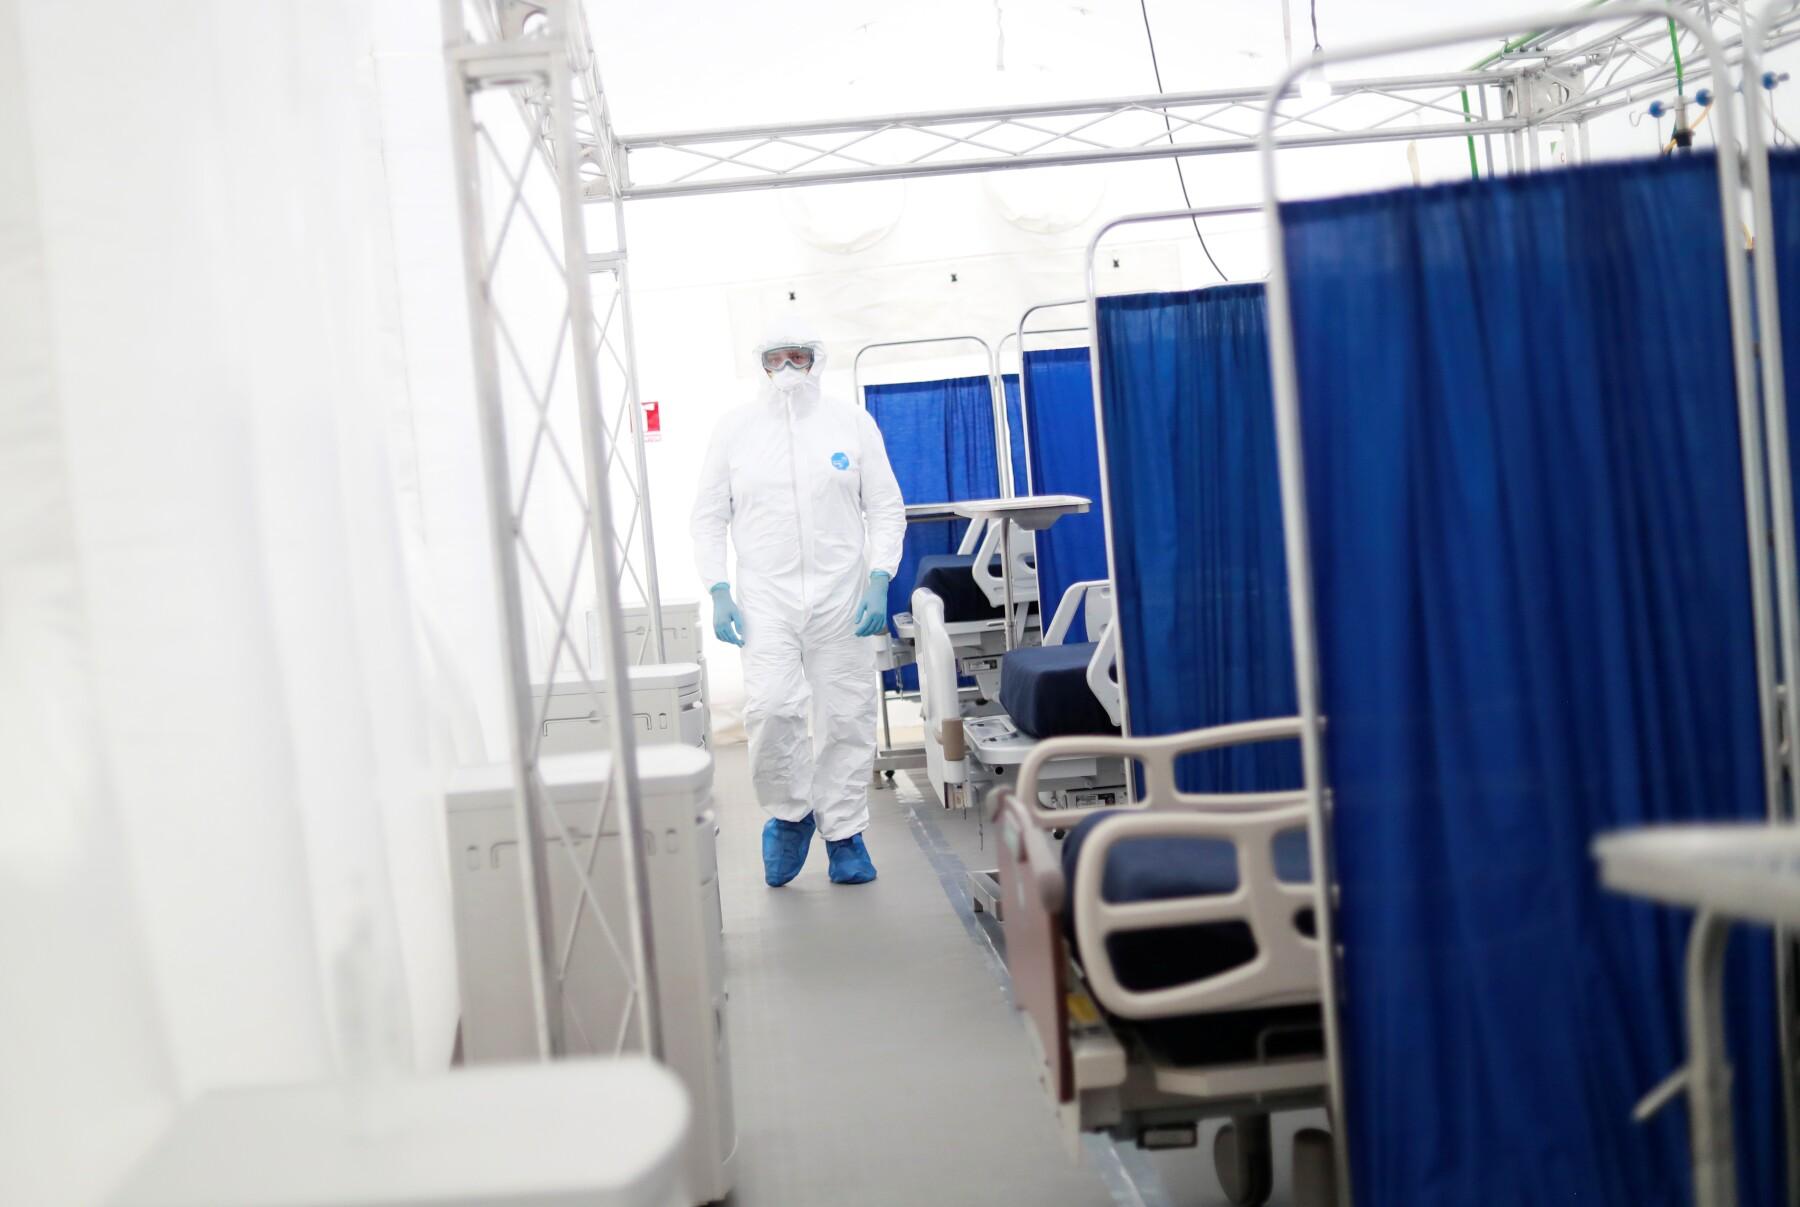 México hospital coronavirus